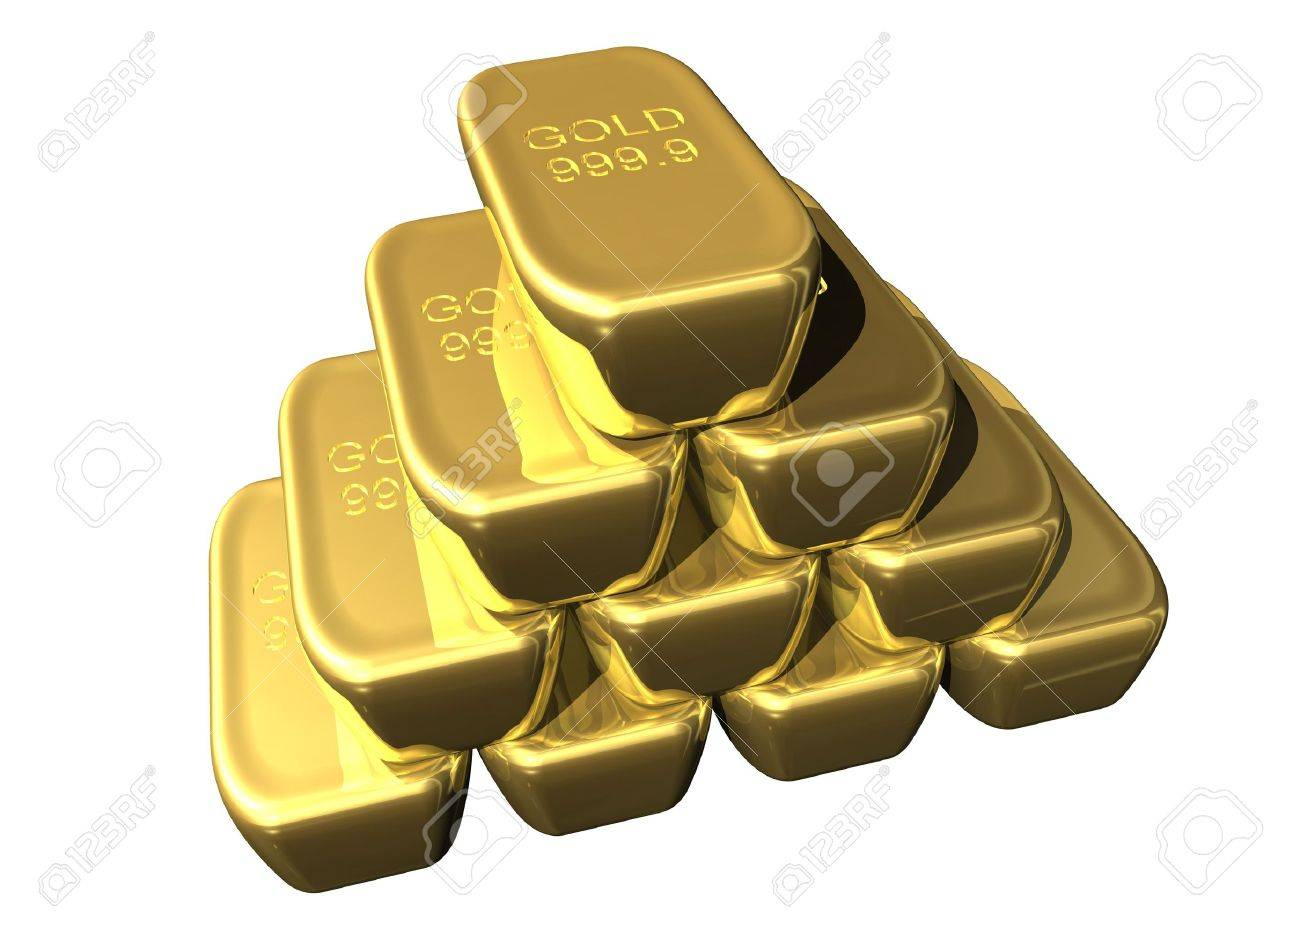 Staple of gold bars Stock Photo - 716258